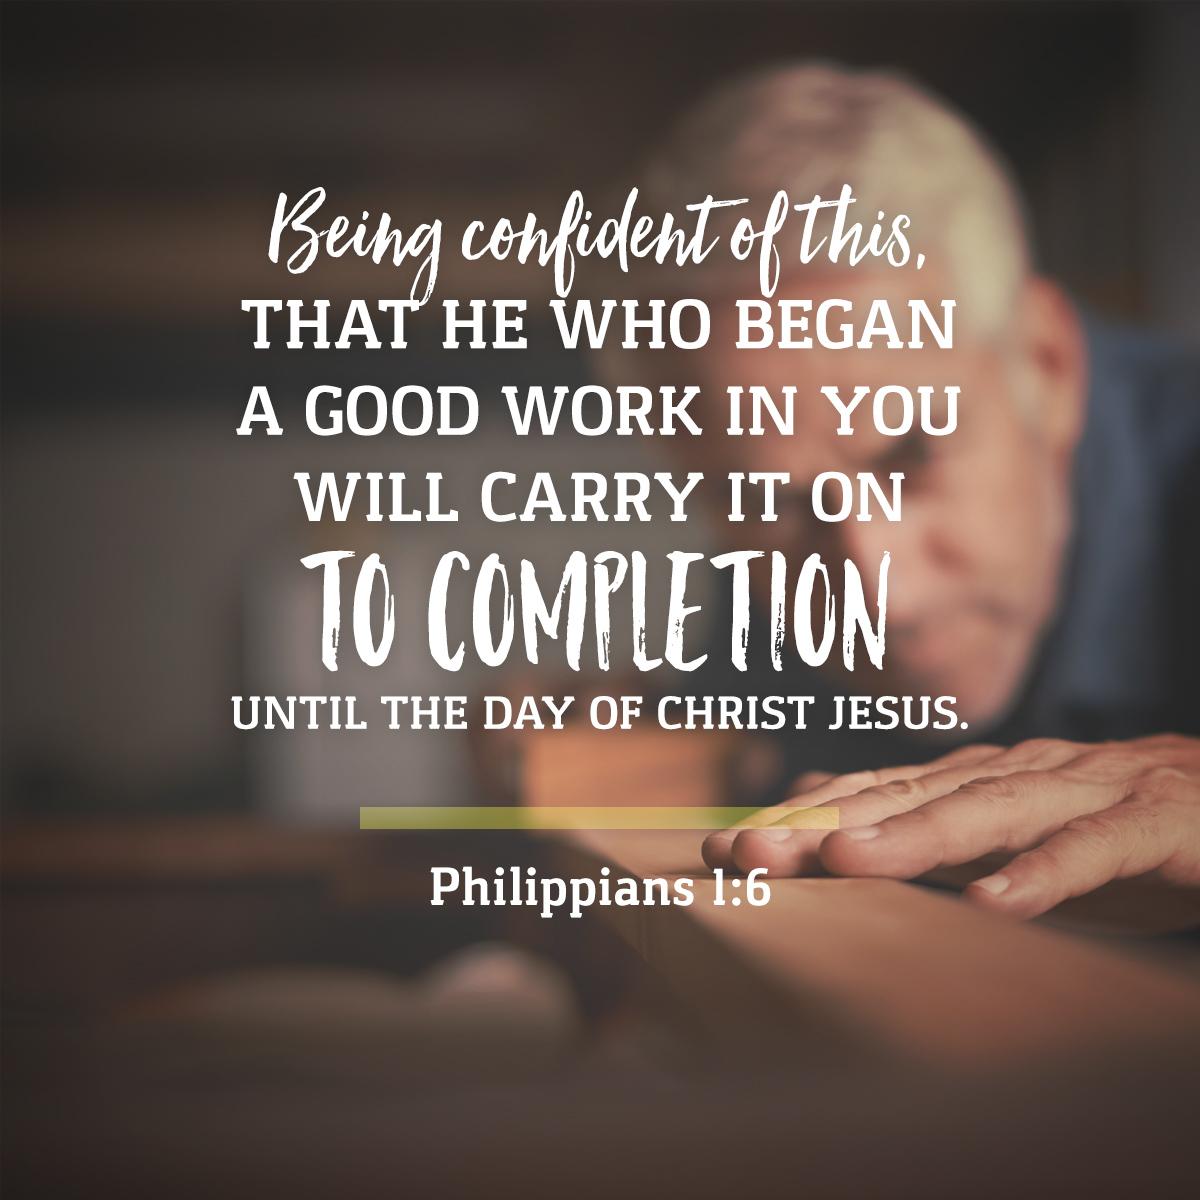 Philippians 1:6 Daily Verse